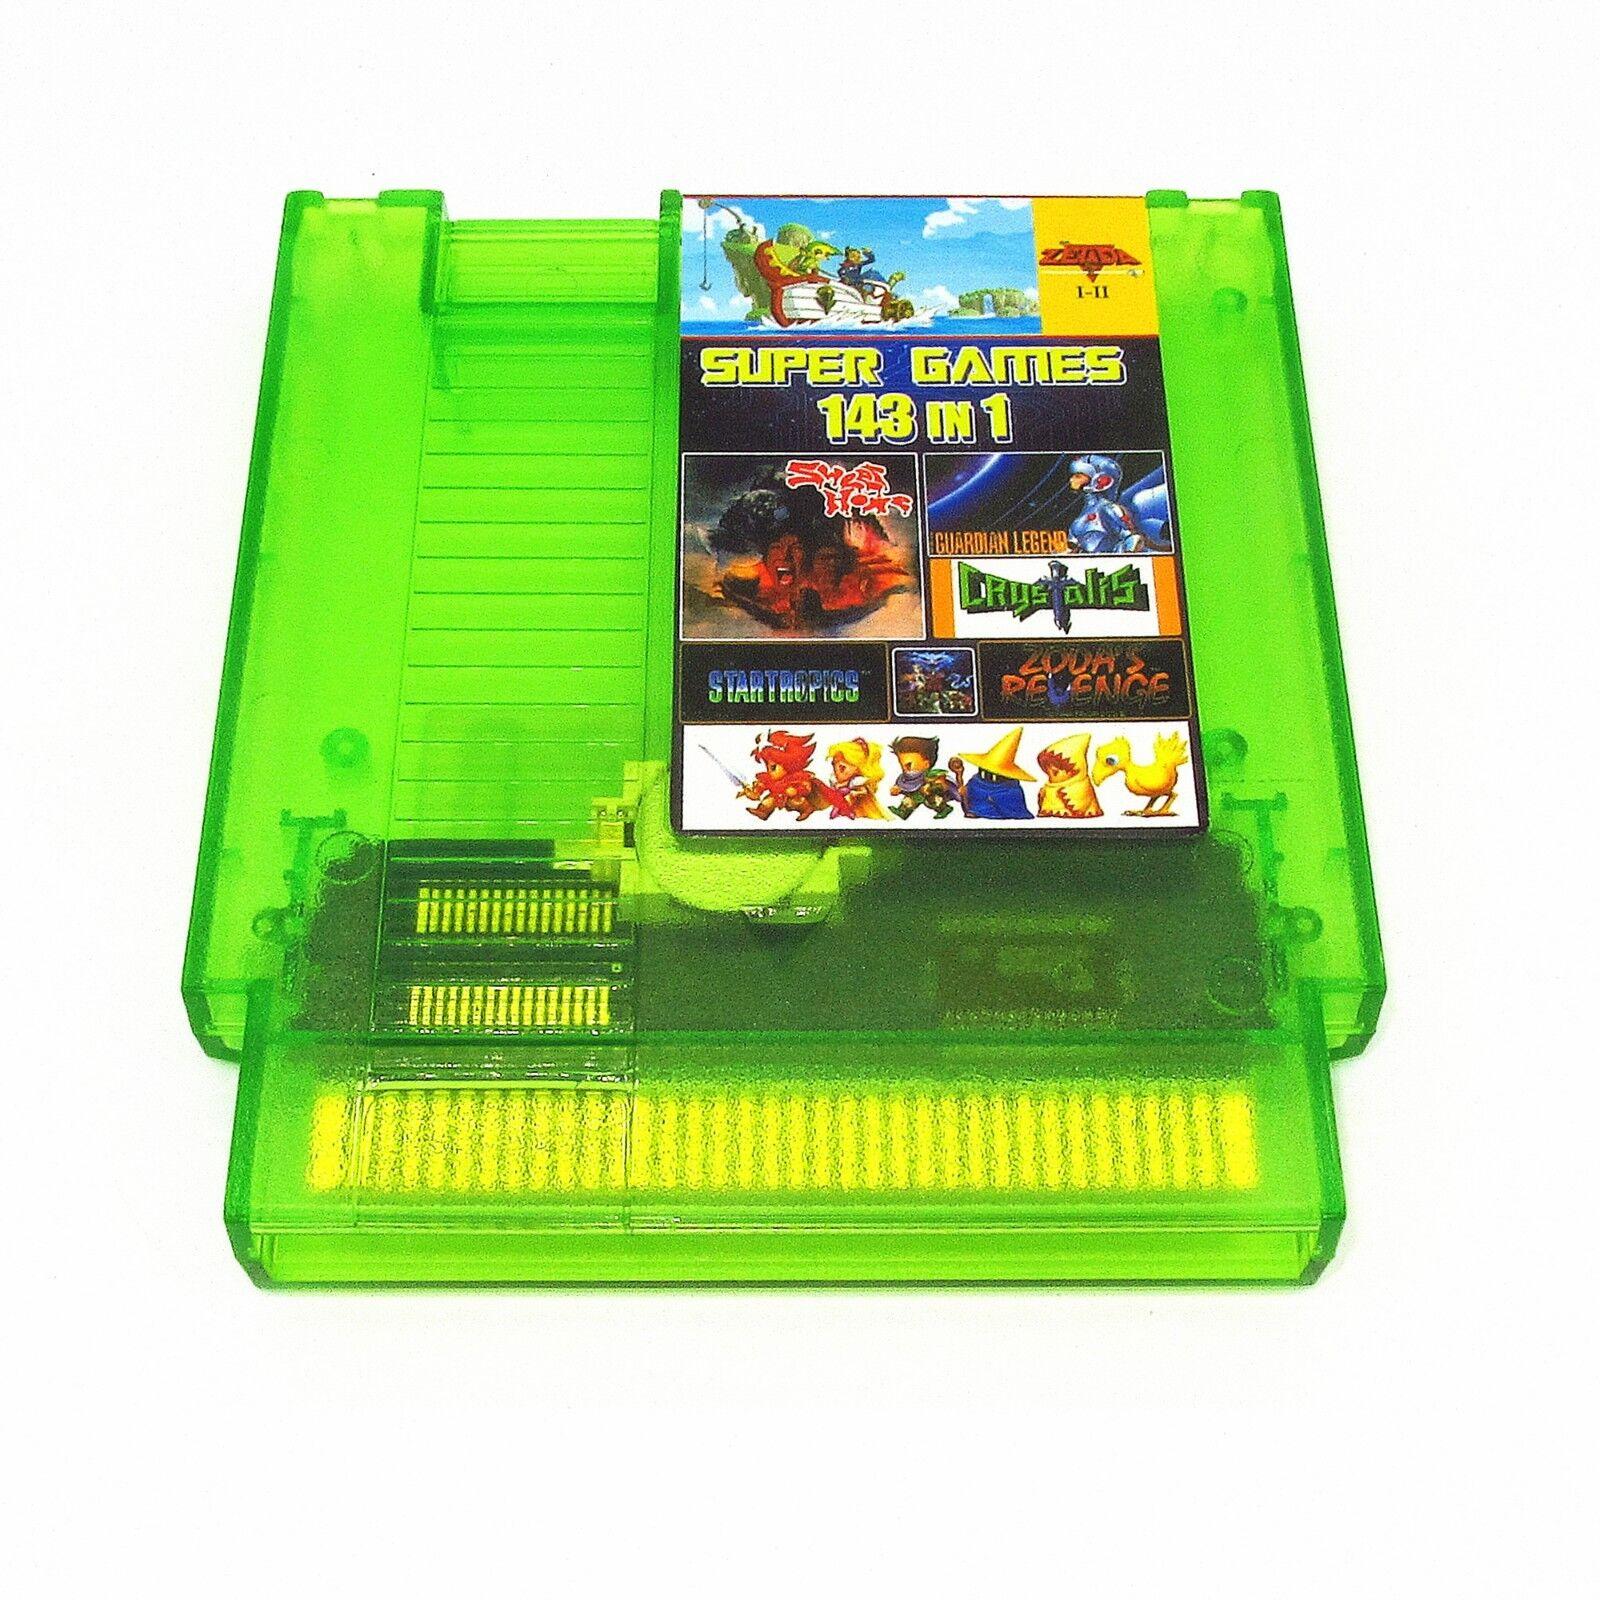 Super Games 143 in 1 Nintendo NES Cartridge Multicart - Newe